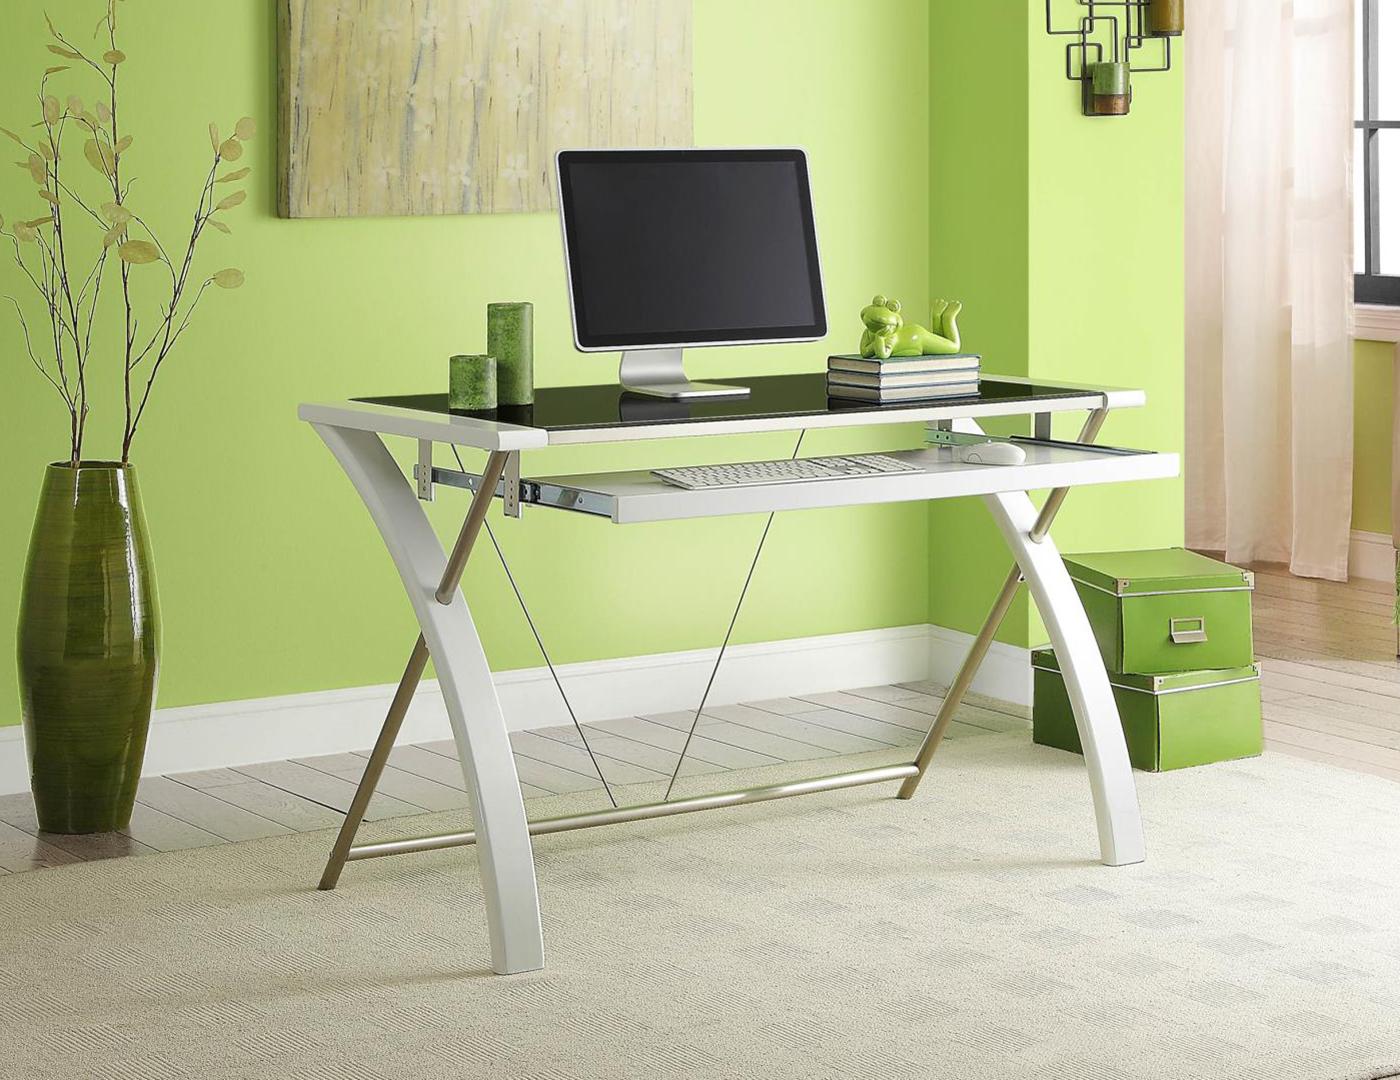 zeta desk chair steel egg steinhafels clearance office